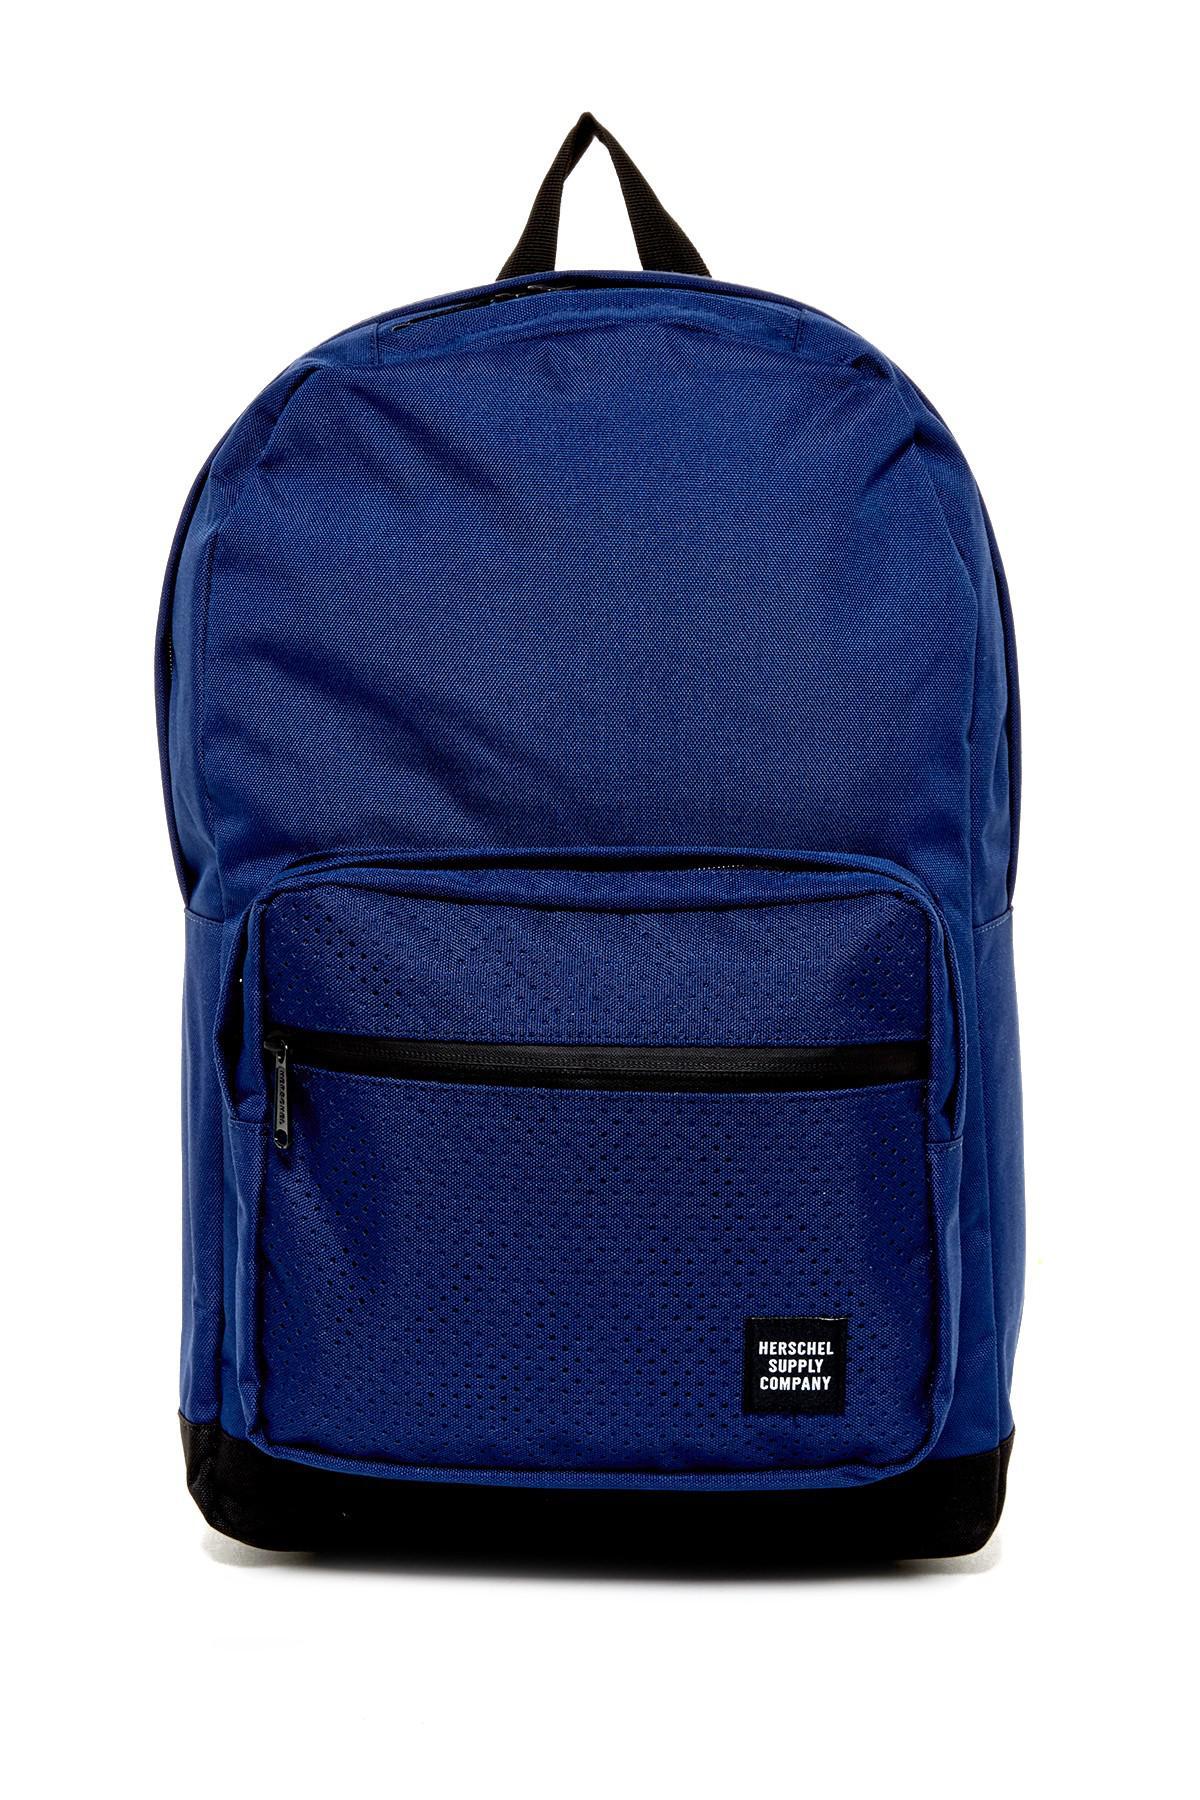 Lyst - Herschel Supply Co. Pop Quiz Backpack for Men 509865362ab16